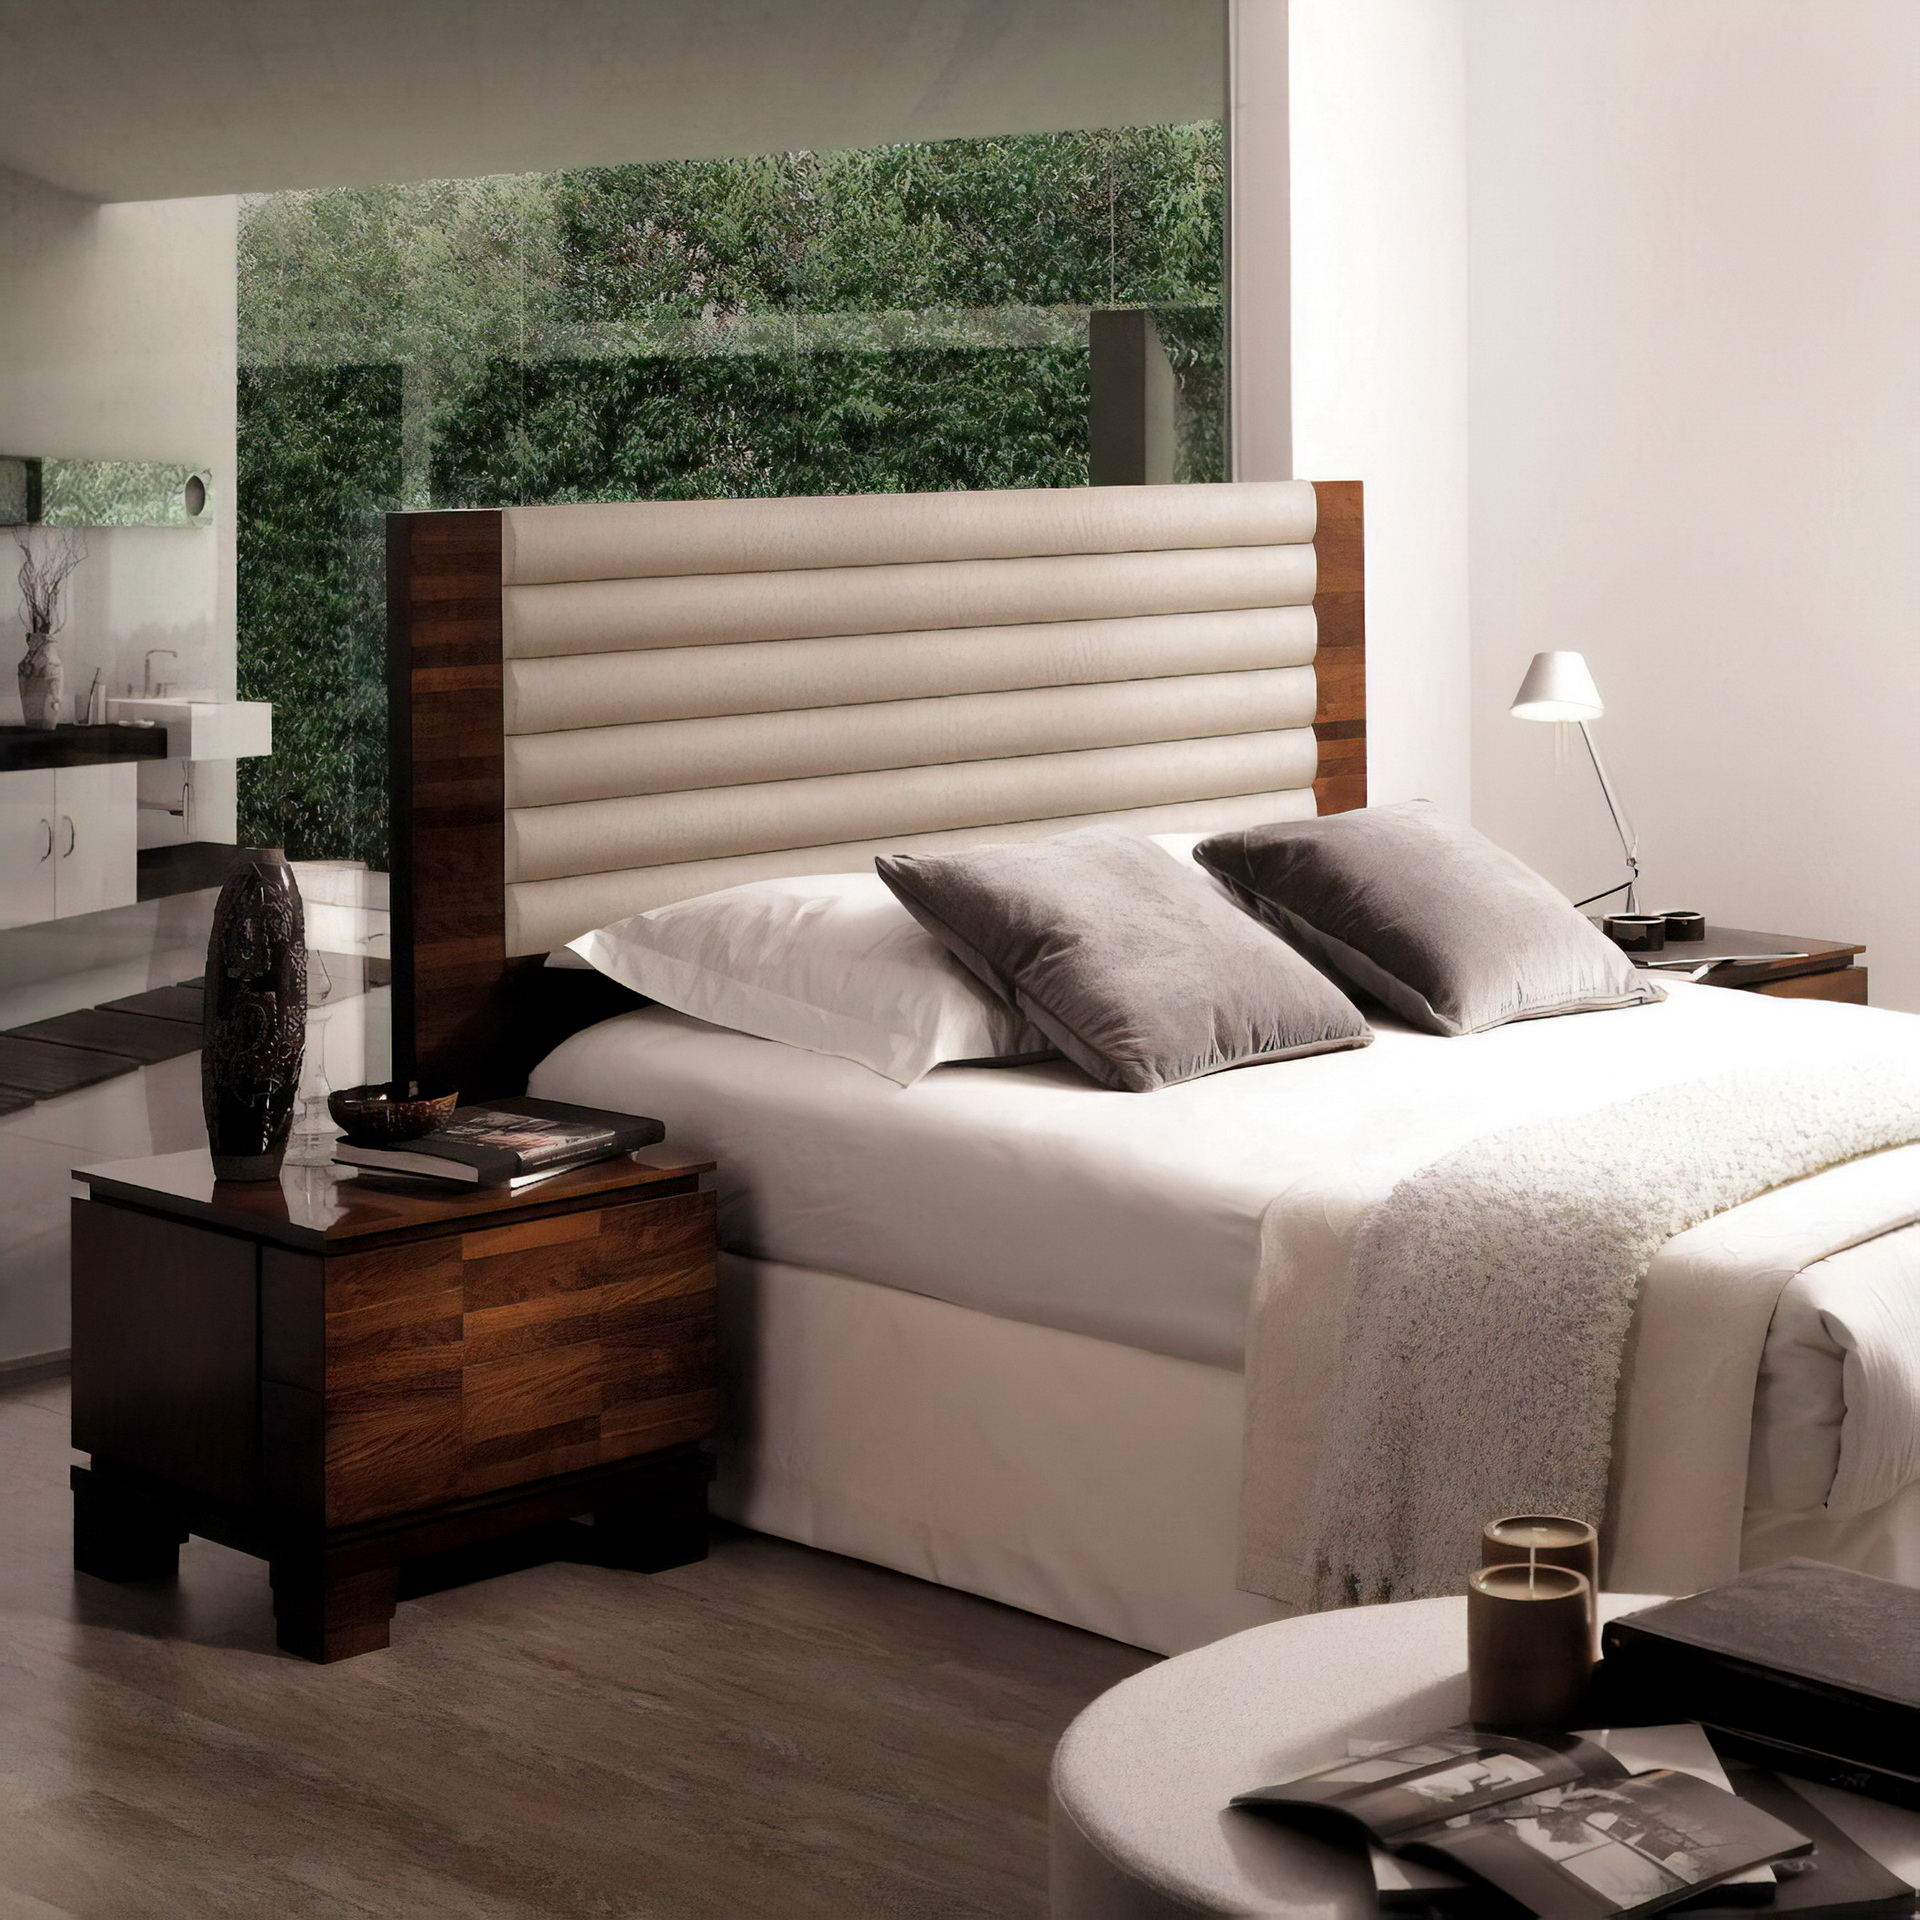 Moderno muebles de camas tapizadas molde muebles para for Muebles hurtado